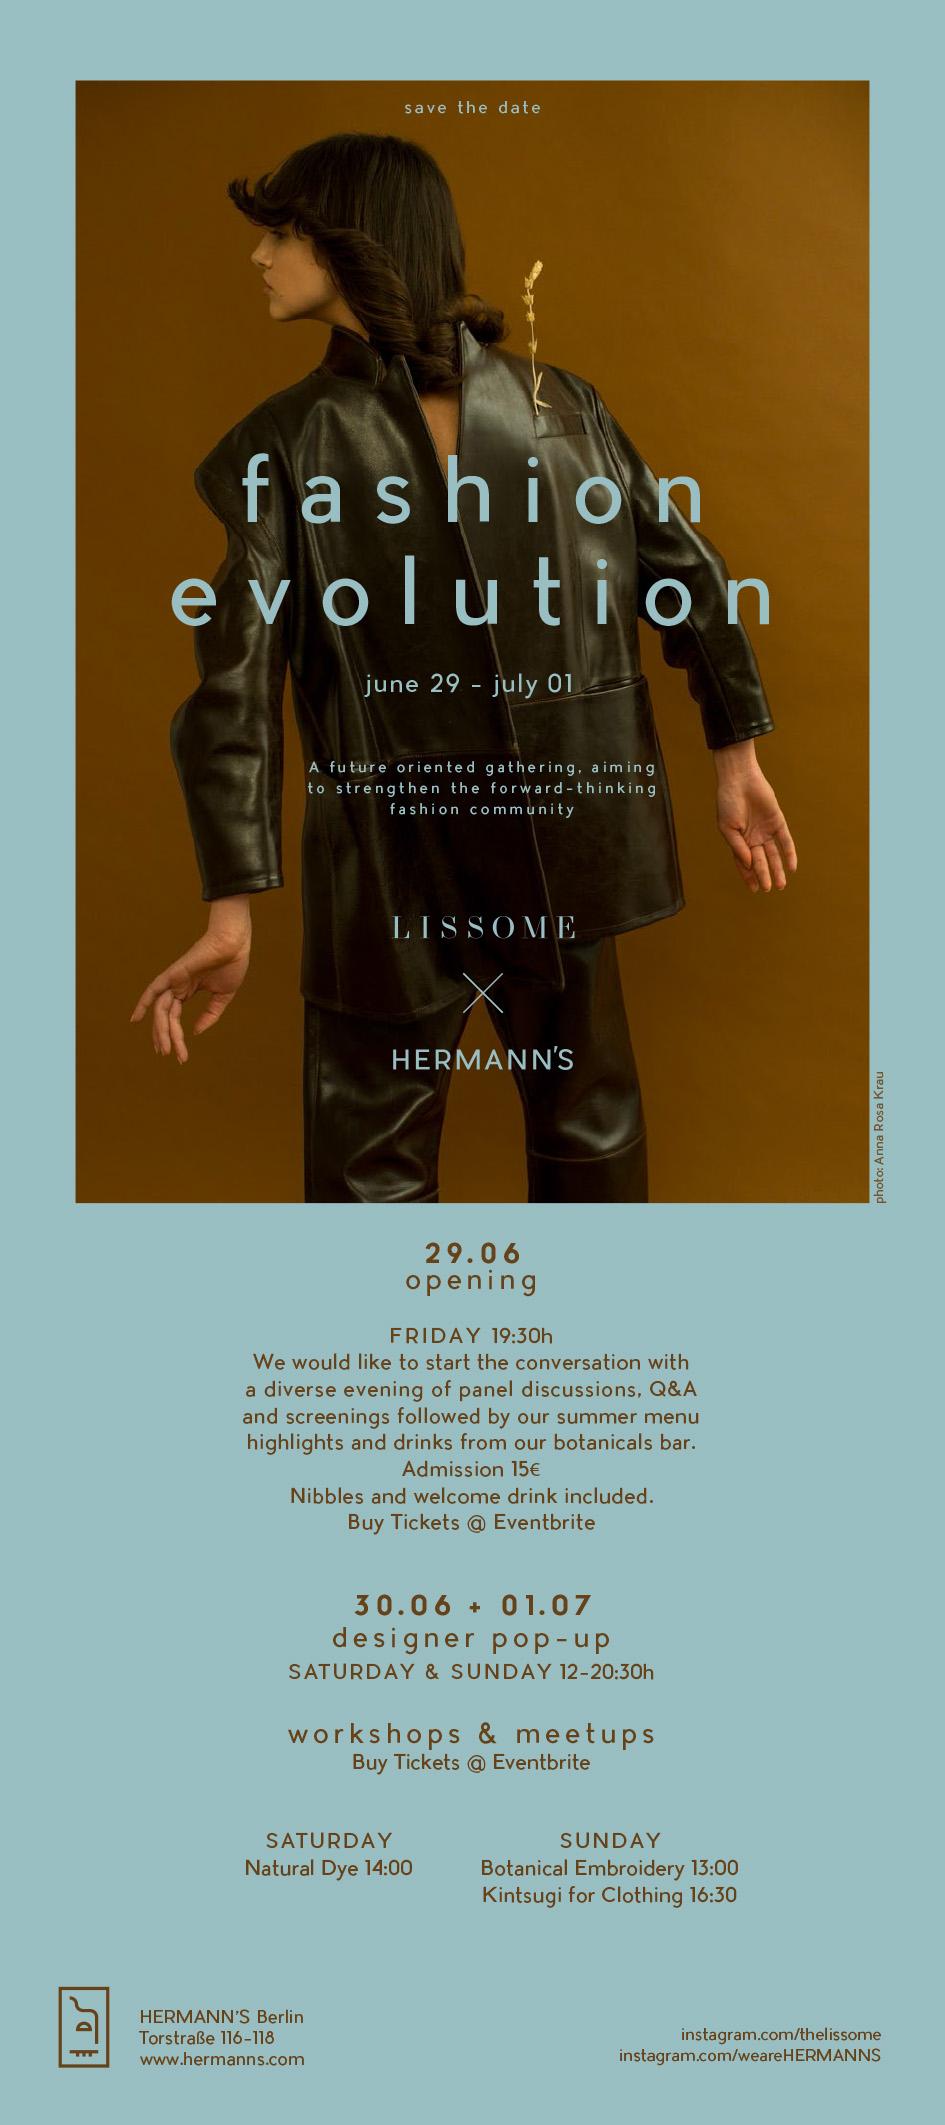 Fashion Evolution_save the date v2.jpg